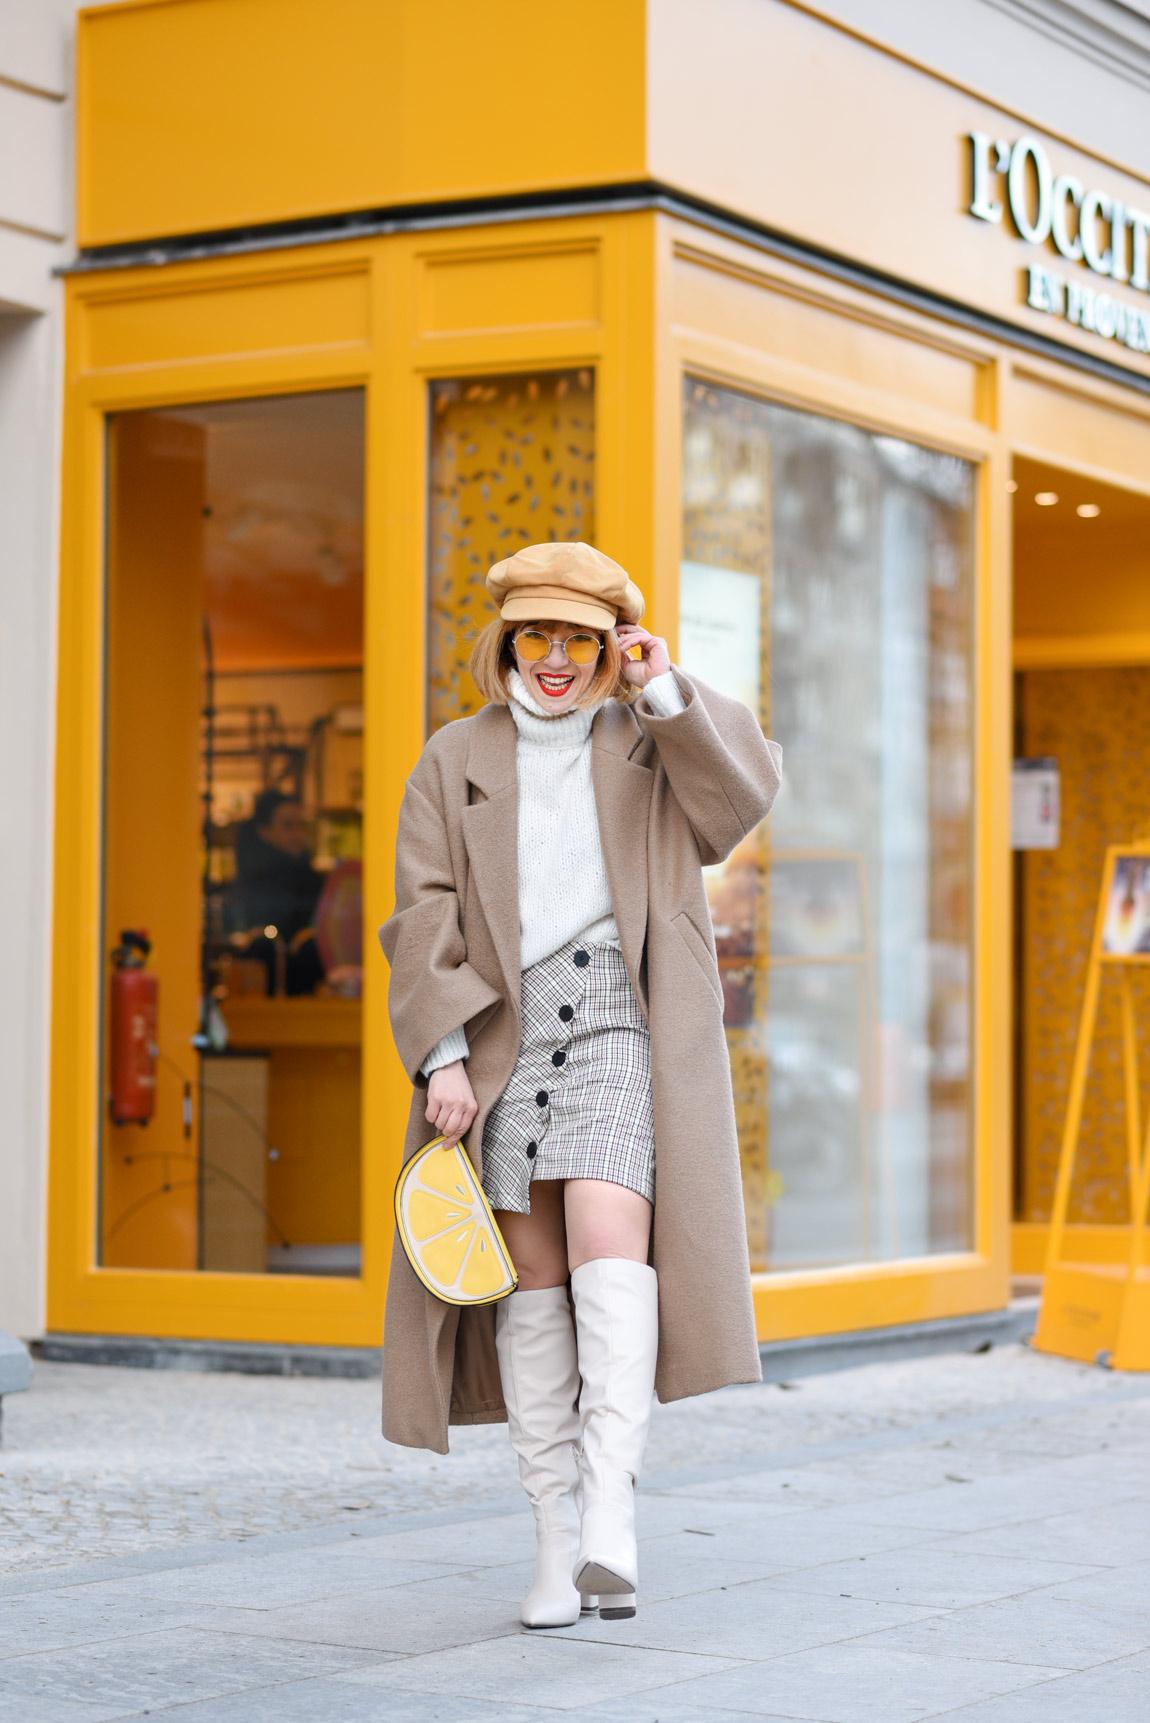 aufregen, alltag, problem, berlin, outfit, psychologie, gelb, ootd, fashionblog, modeblog, streetstyle, mini, mantel, hm, trend